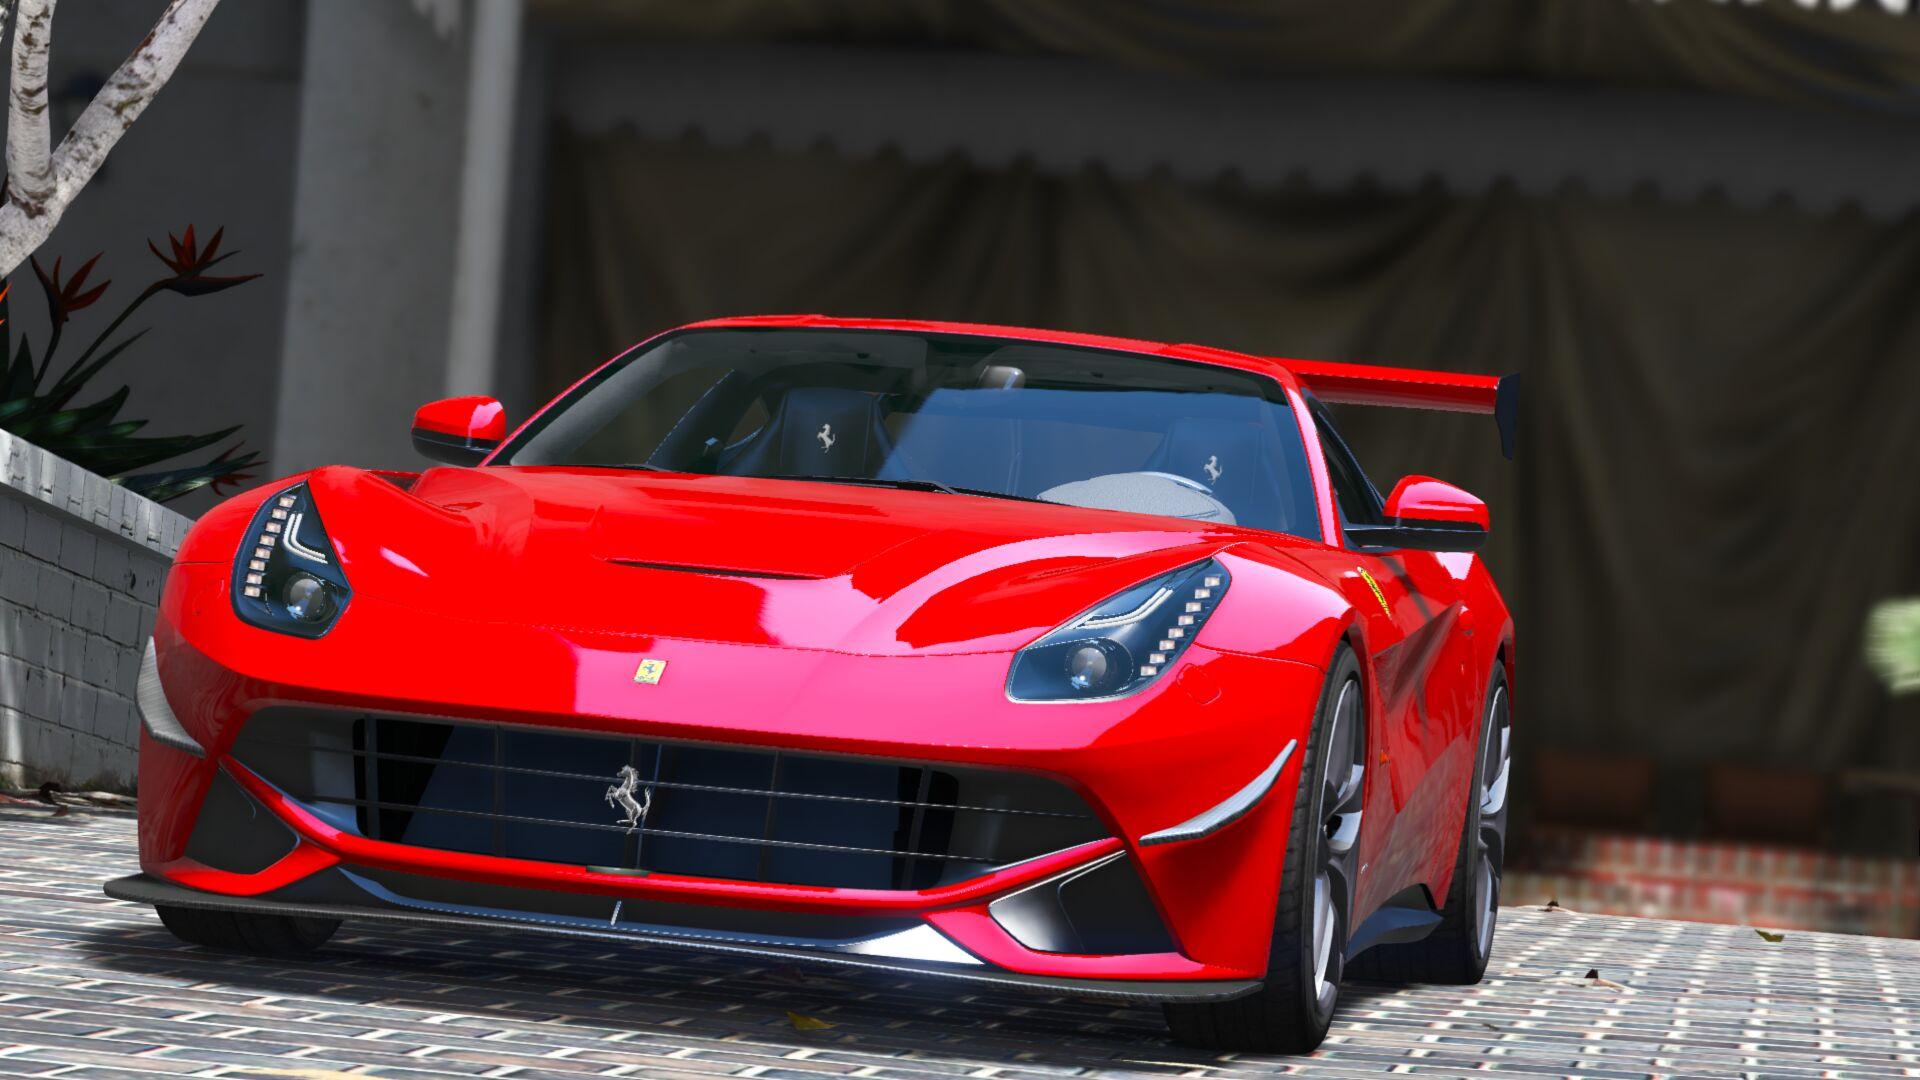 Nfs Rivals Cars Wallpaper 2013 Ferrari F12 Berlinetta Gta5 Mods Com